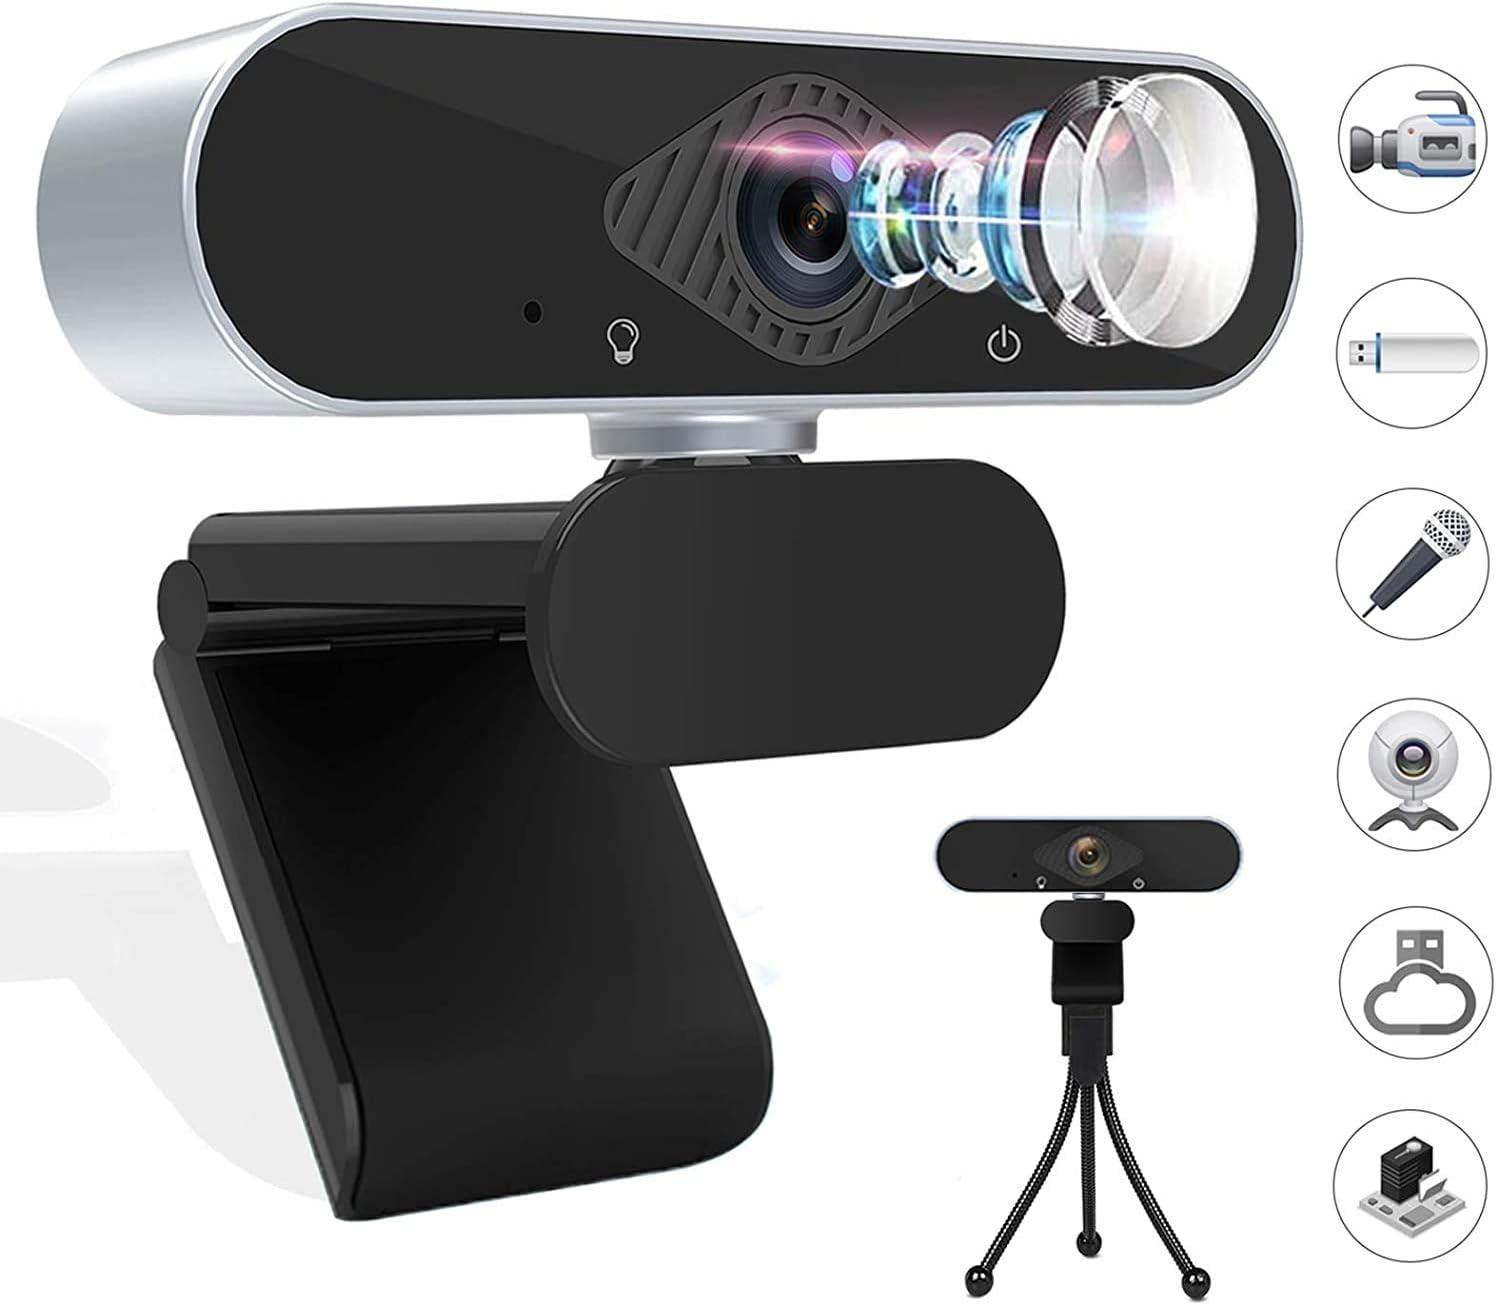 80% Off Coupon – Webcam 1080p HD Computer Camera